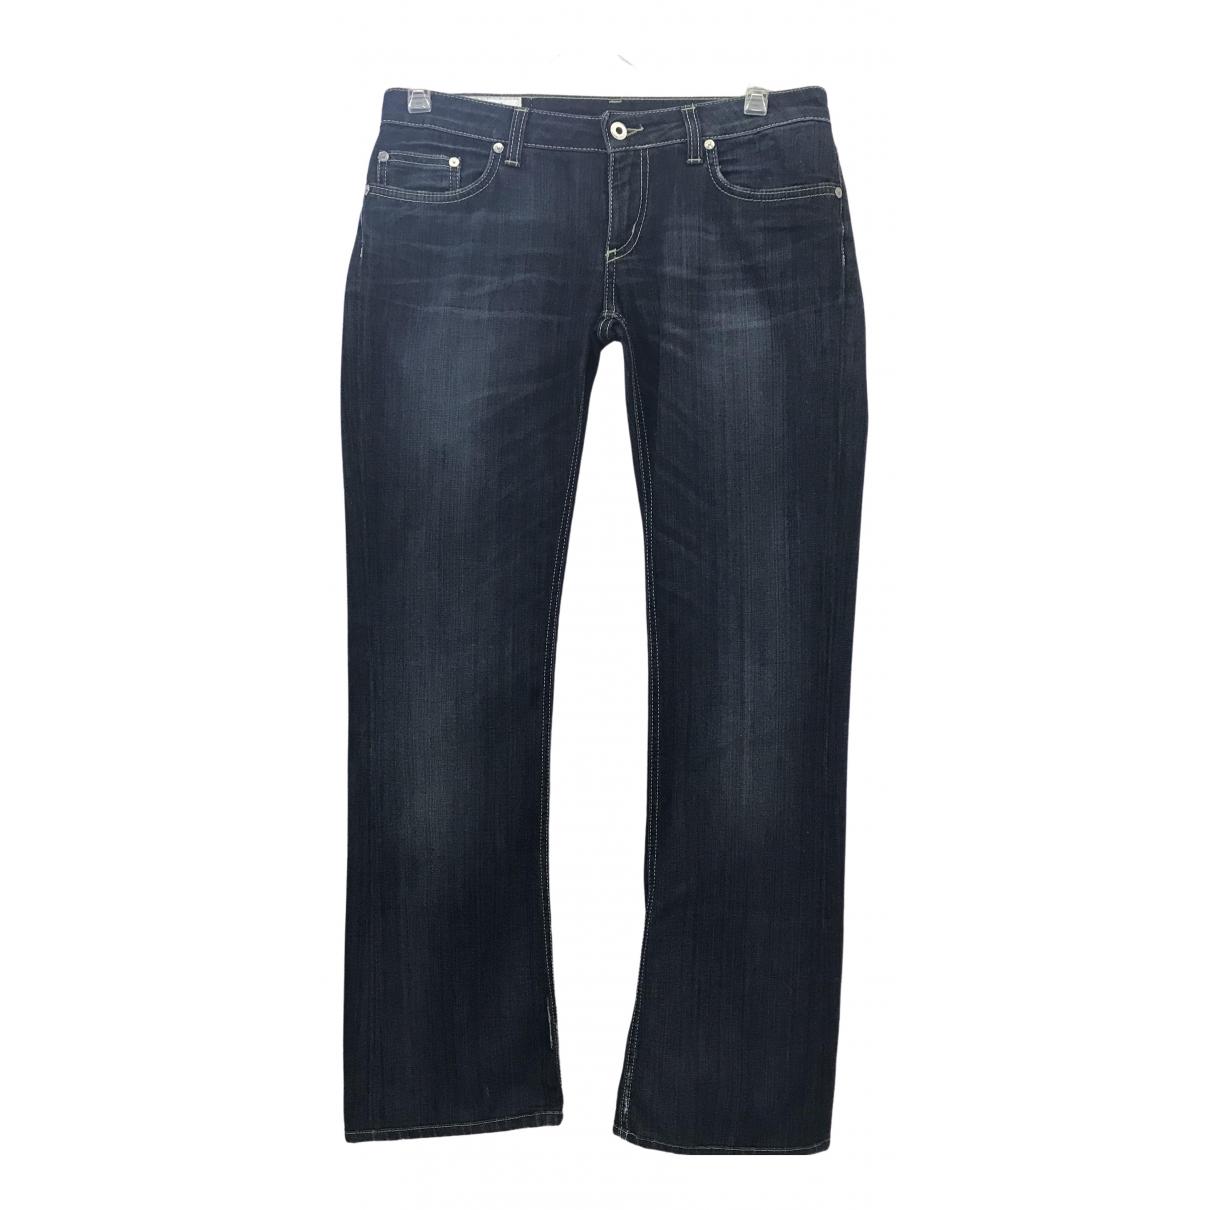 Dondup \N Denim - Jeans Jeans for Women 29 US